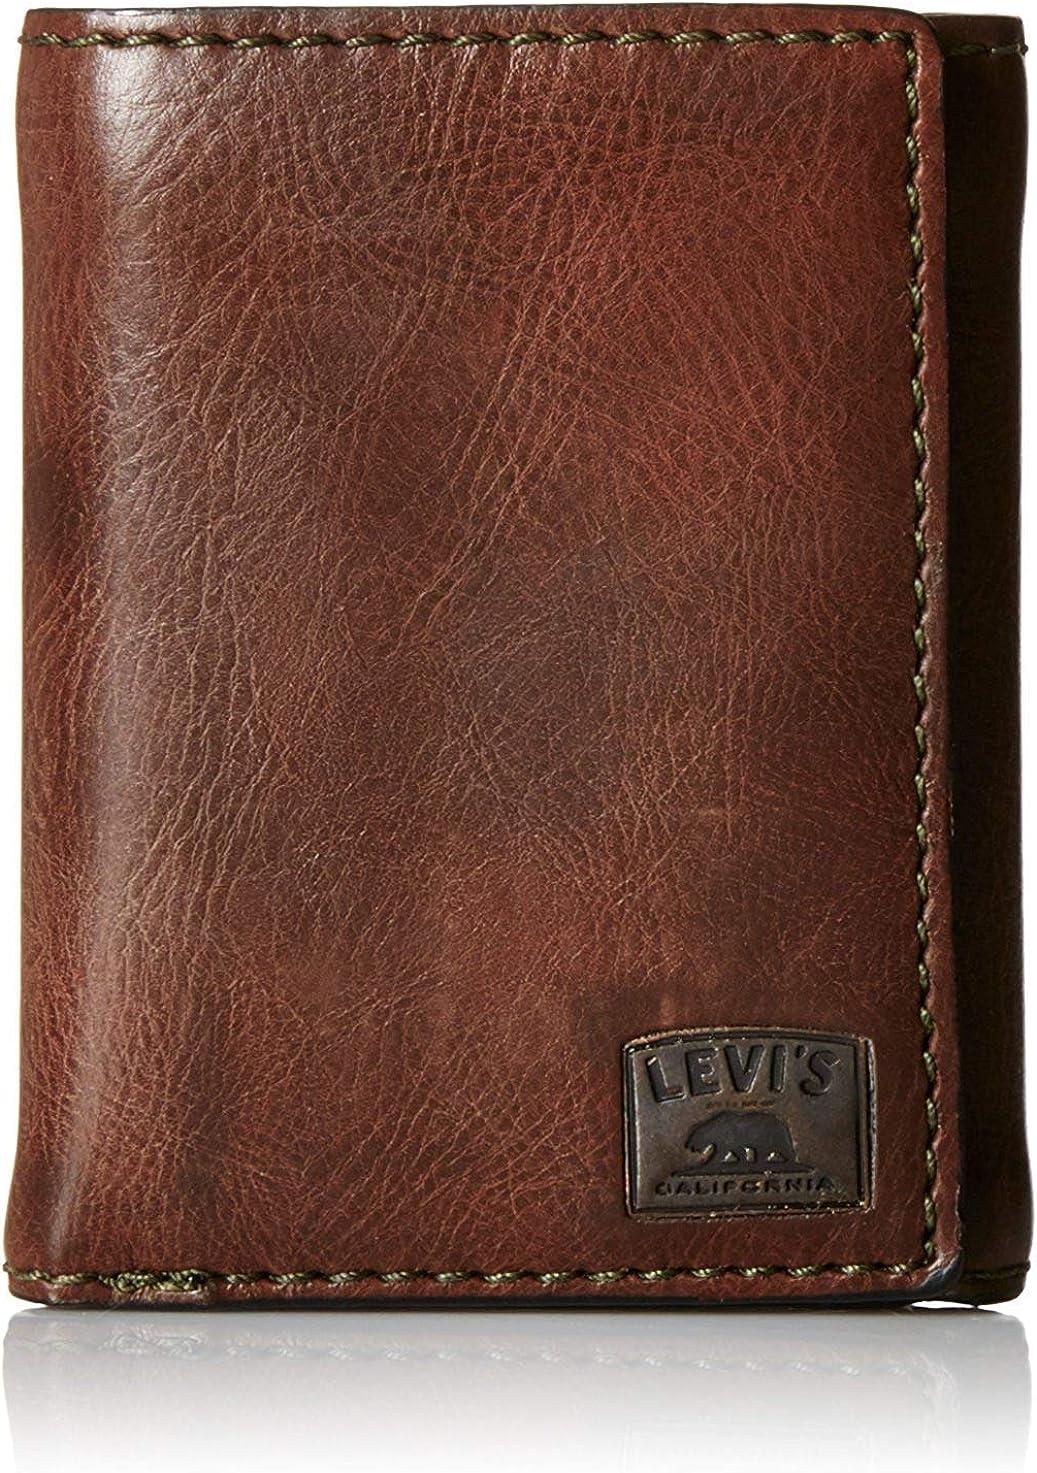 Levi de hombre Trifold cartera con punto de detalle y logotipo